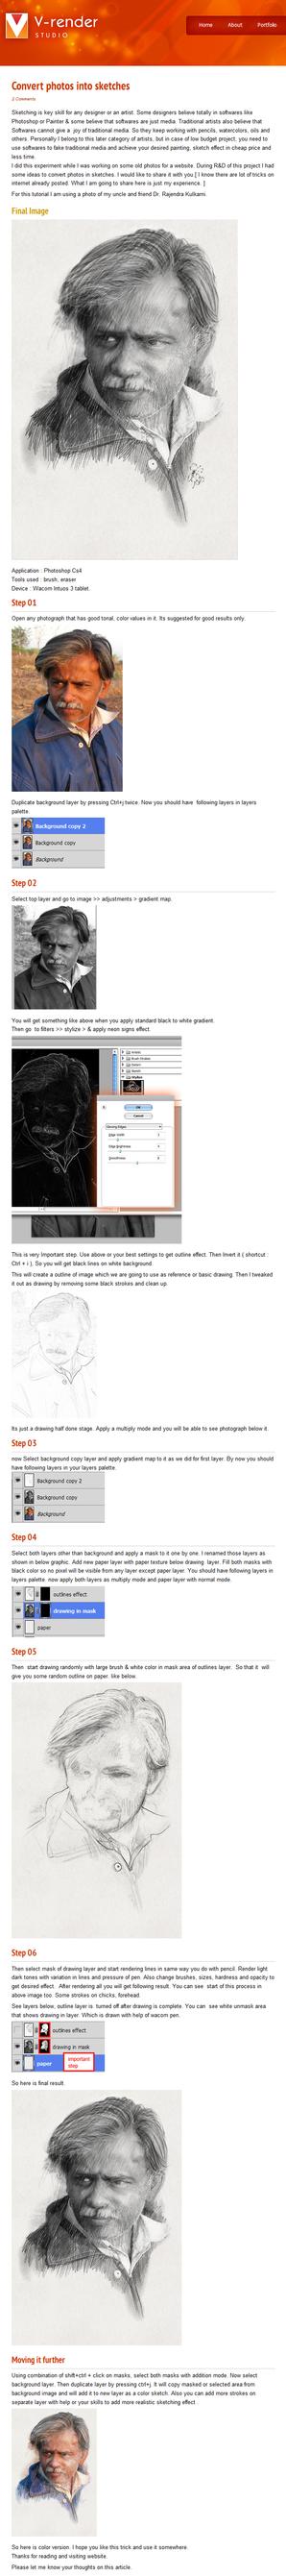 Convert photos into sketches by veeroo18